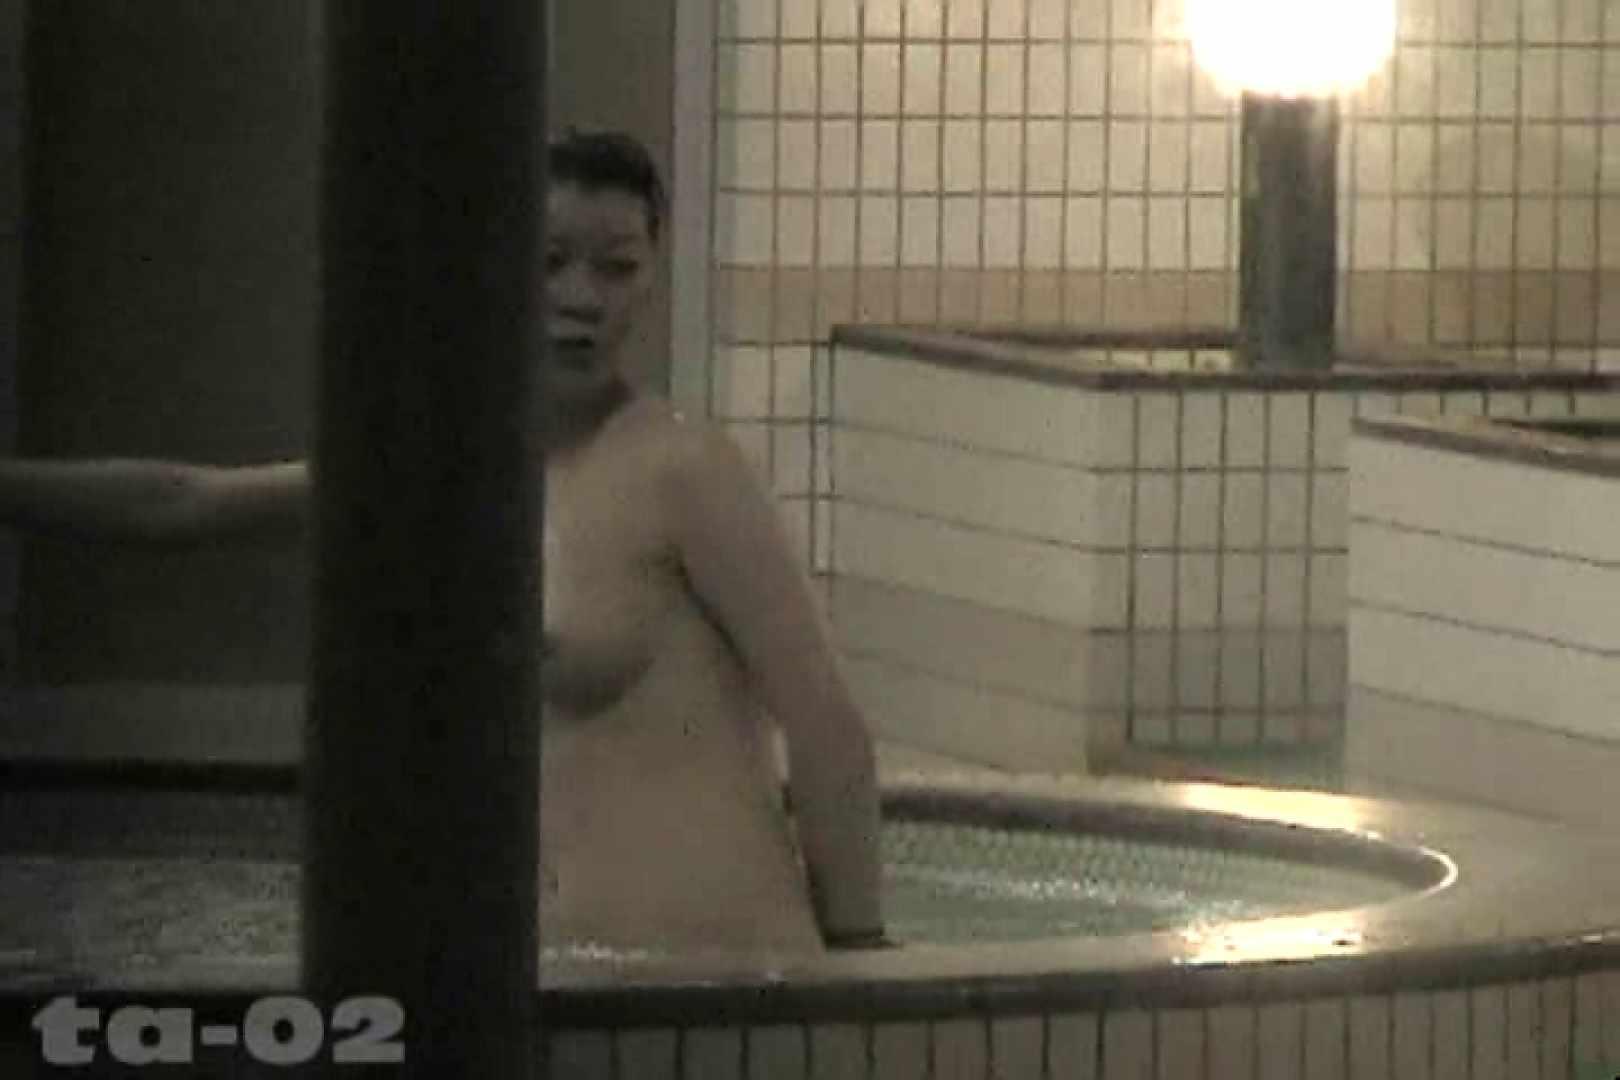 合宿ホテル女風呂盗撮高画質版 Vol.02 盗撮  81PIX 40